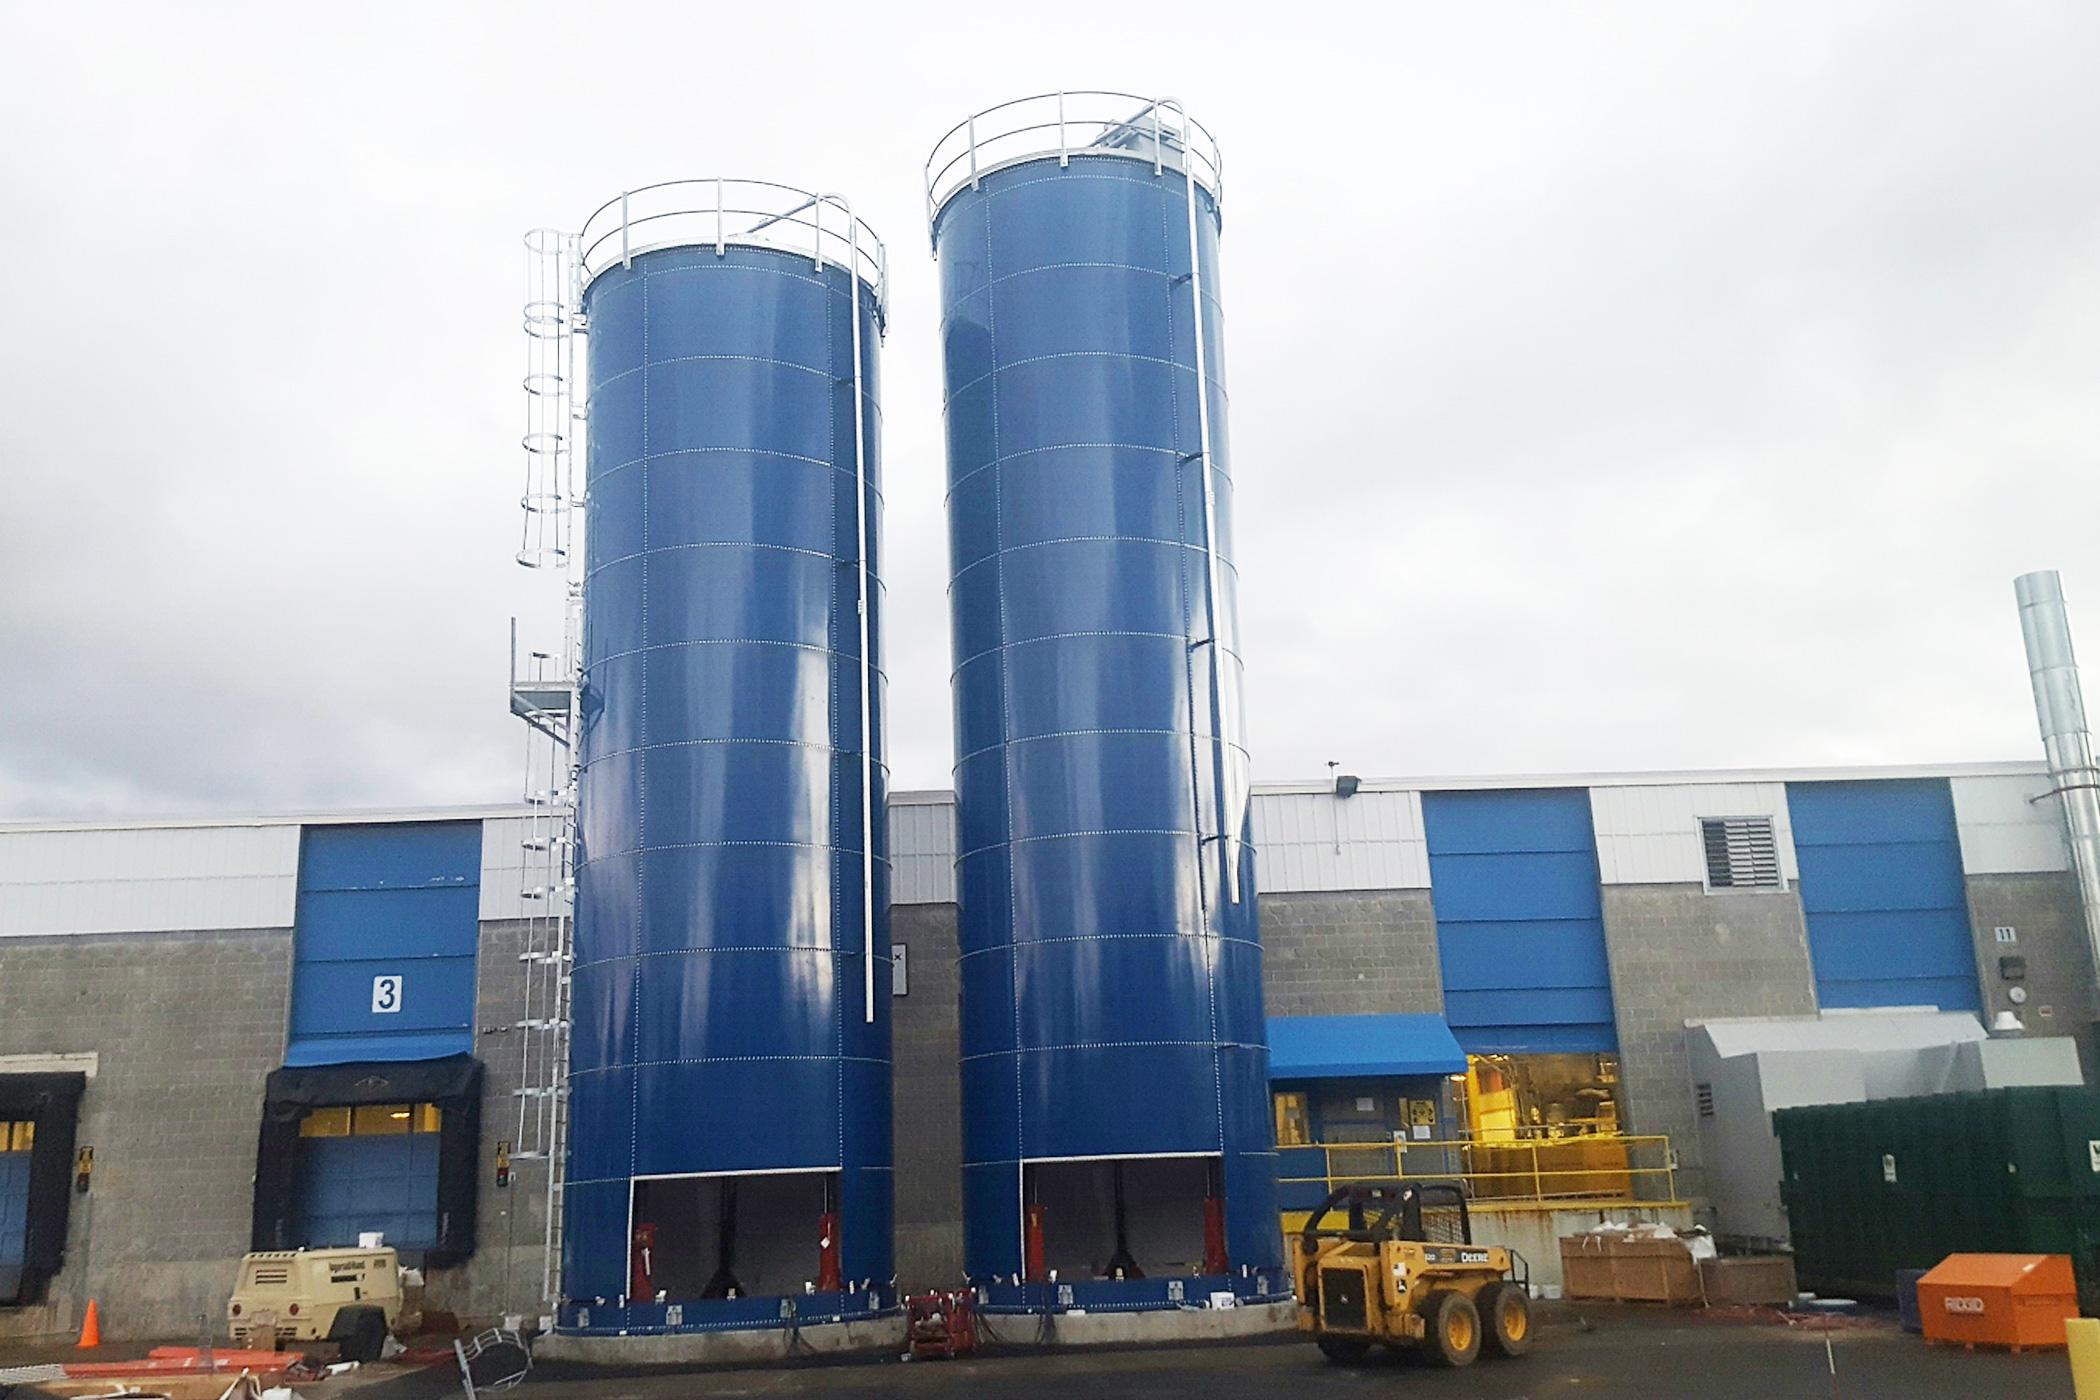 Plastic pellet storage silos